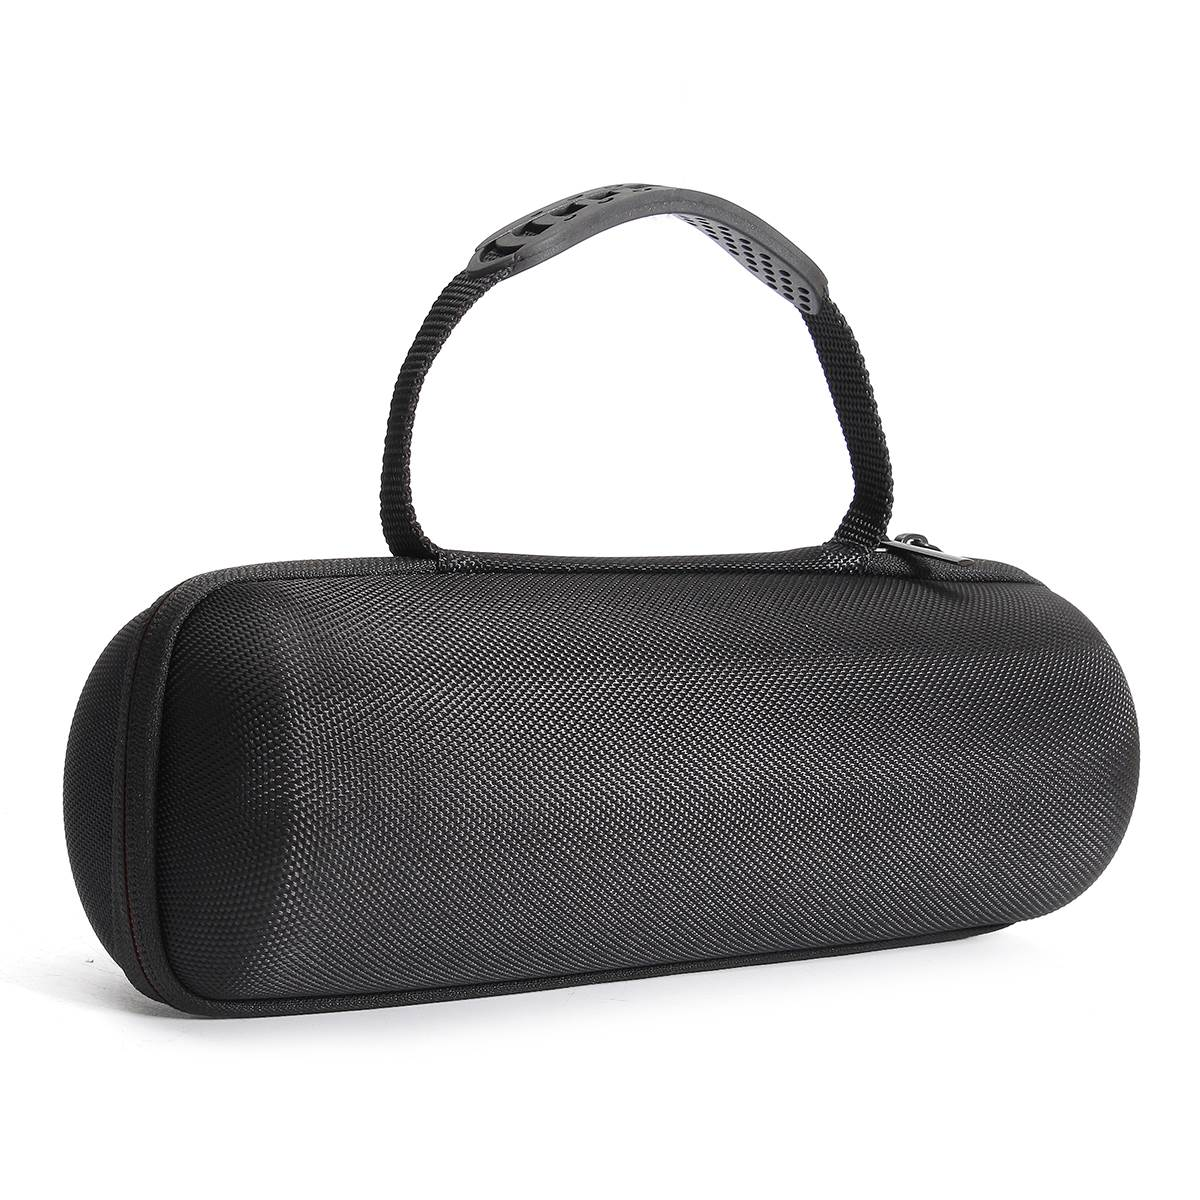 Mejor Portátil Bolsa de transporte dura cubierta protectora de la caja para JBL carga 3 bolsa de Altavoz Bluetooth caso